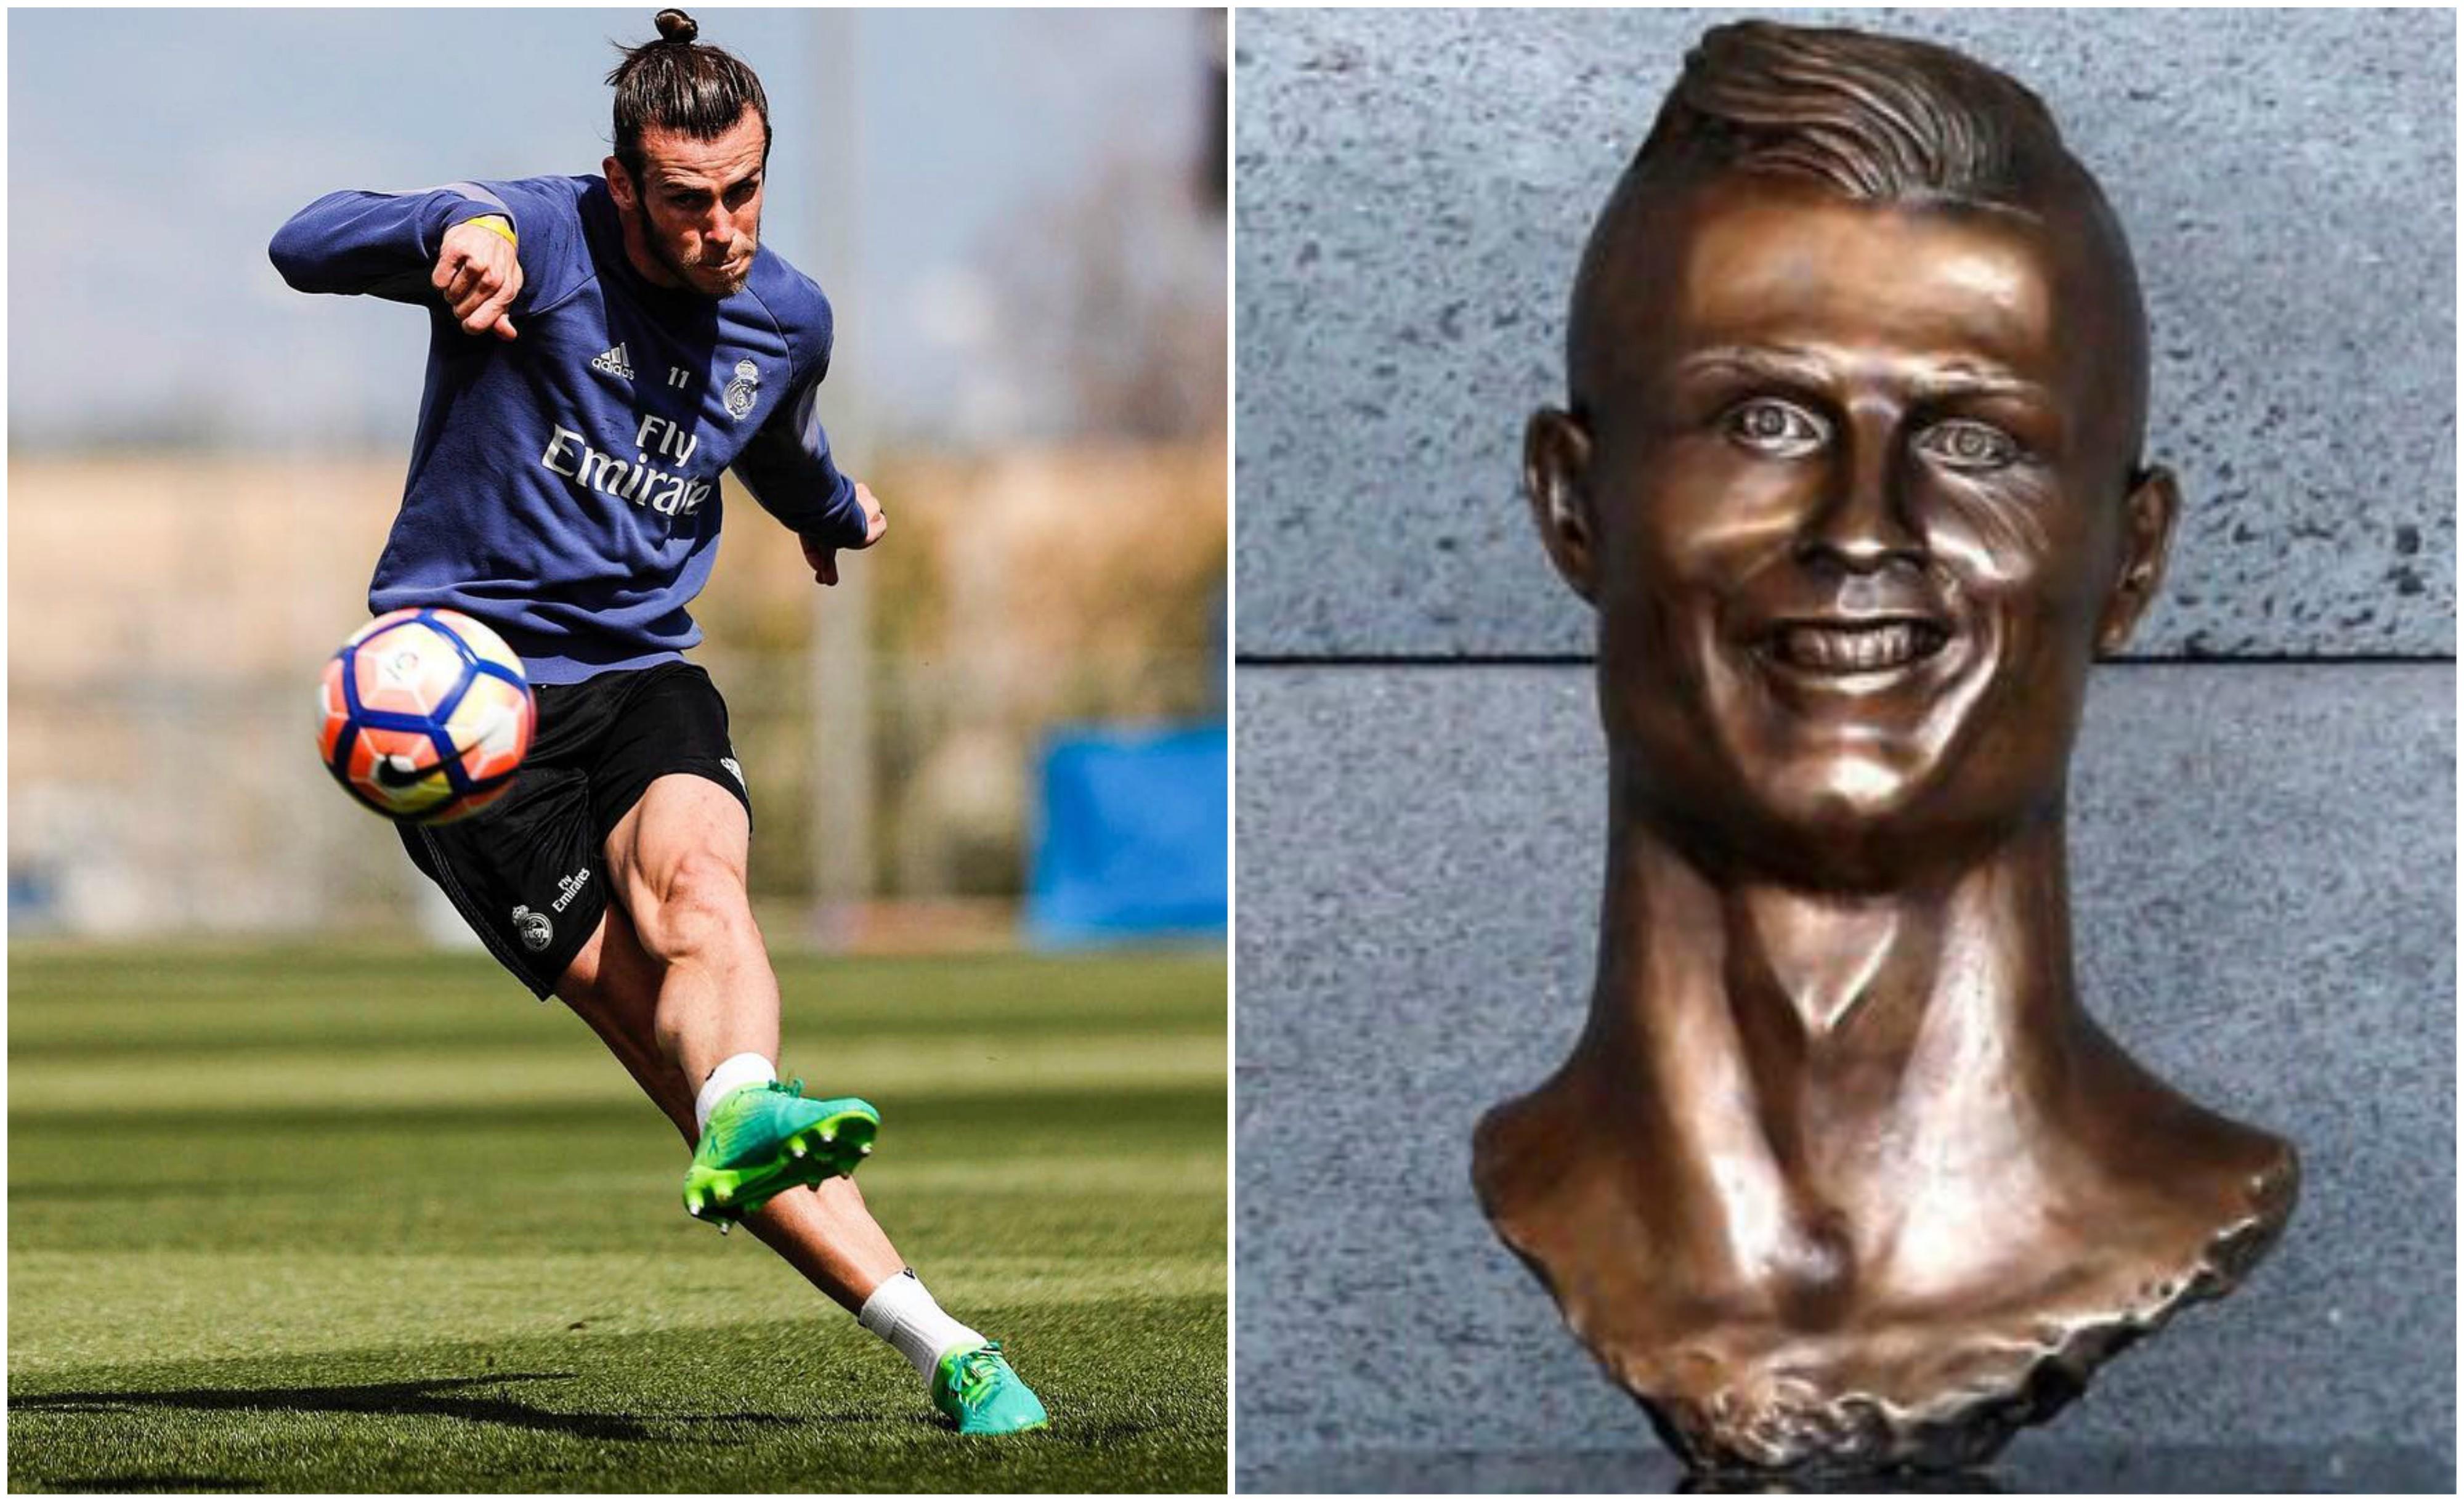 Depois de Ronaldo, madeirense faz busto para Gareth Bale